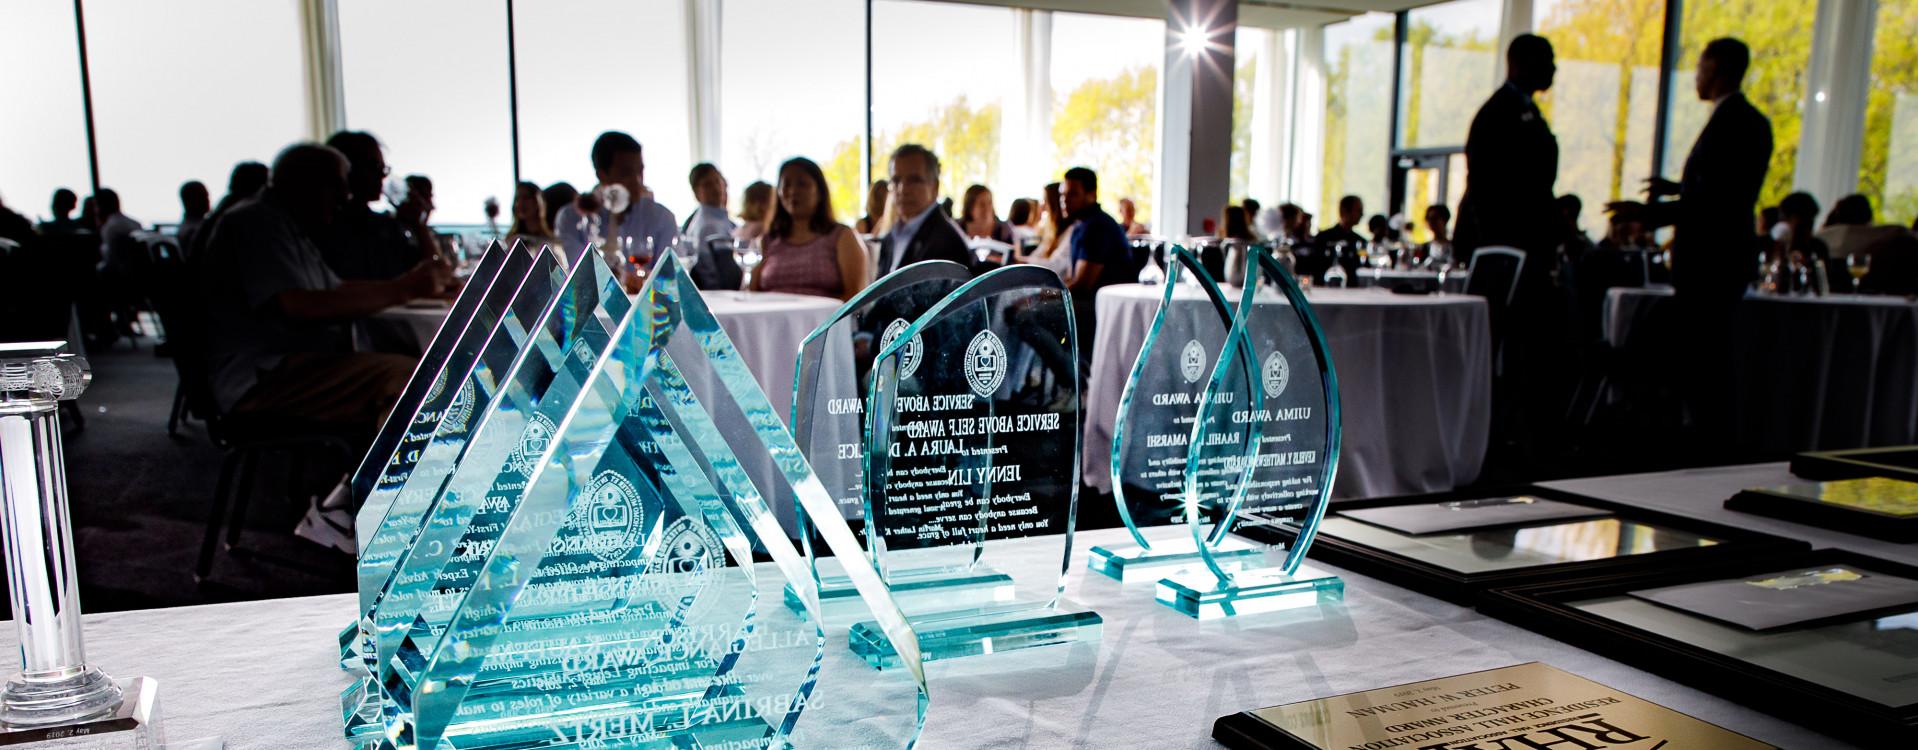 Student Life Leadership Awards Ceremony 2019